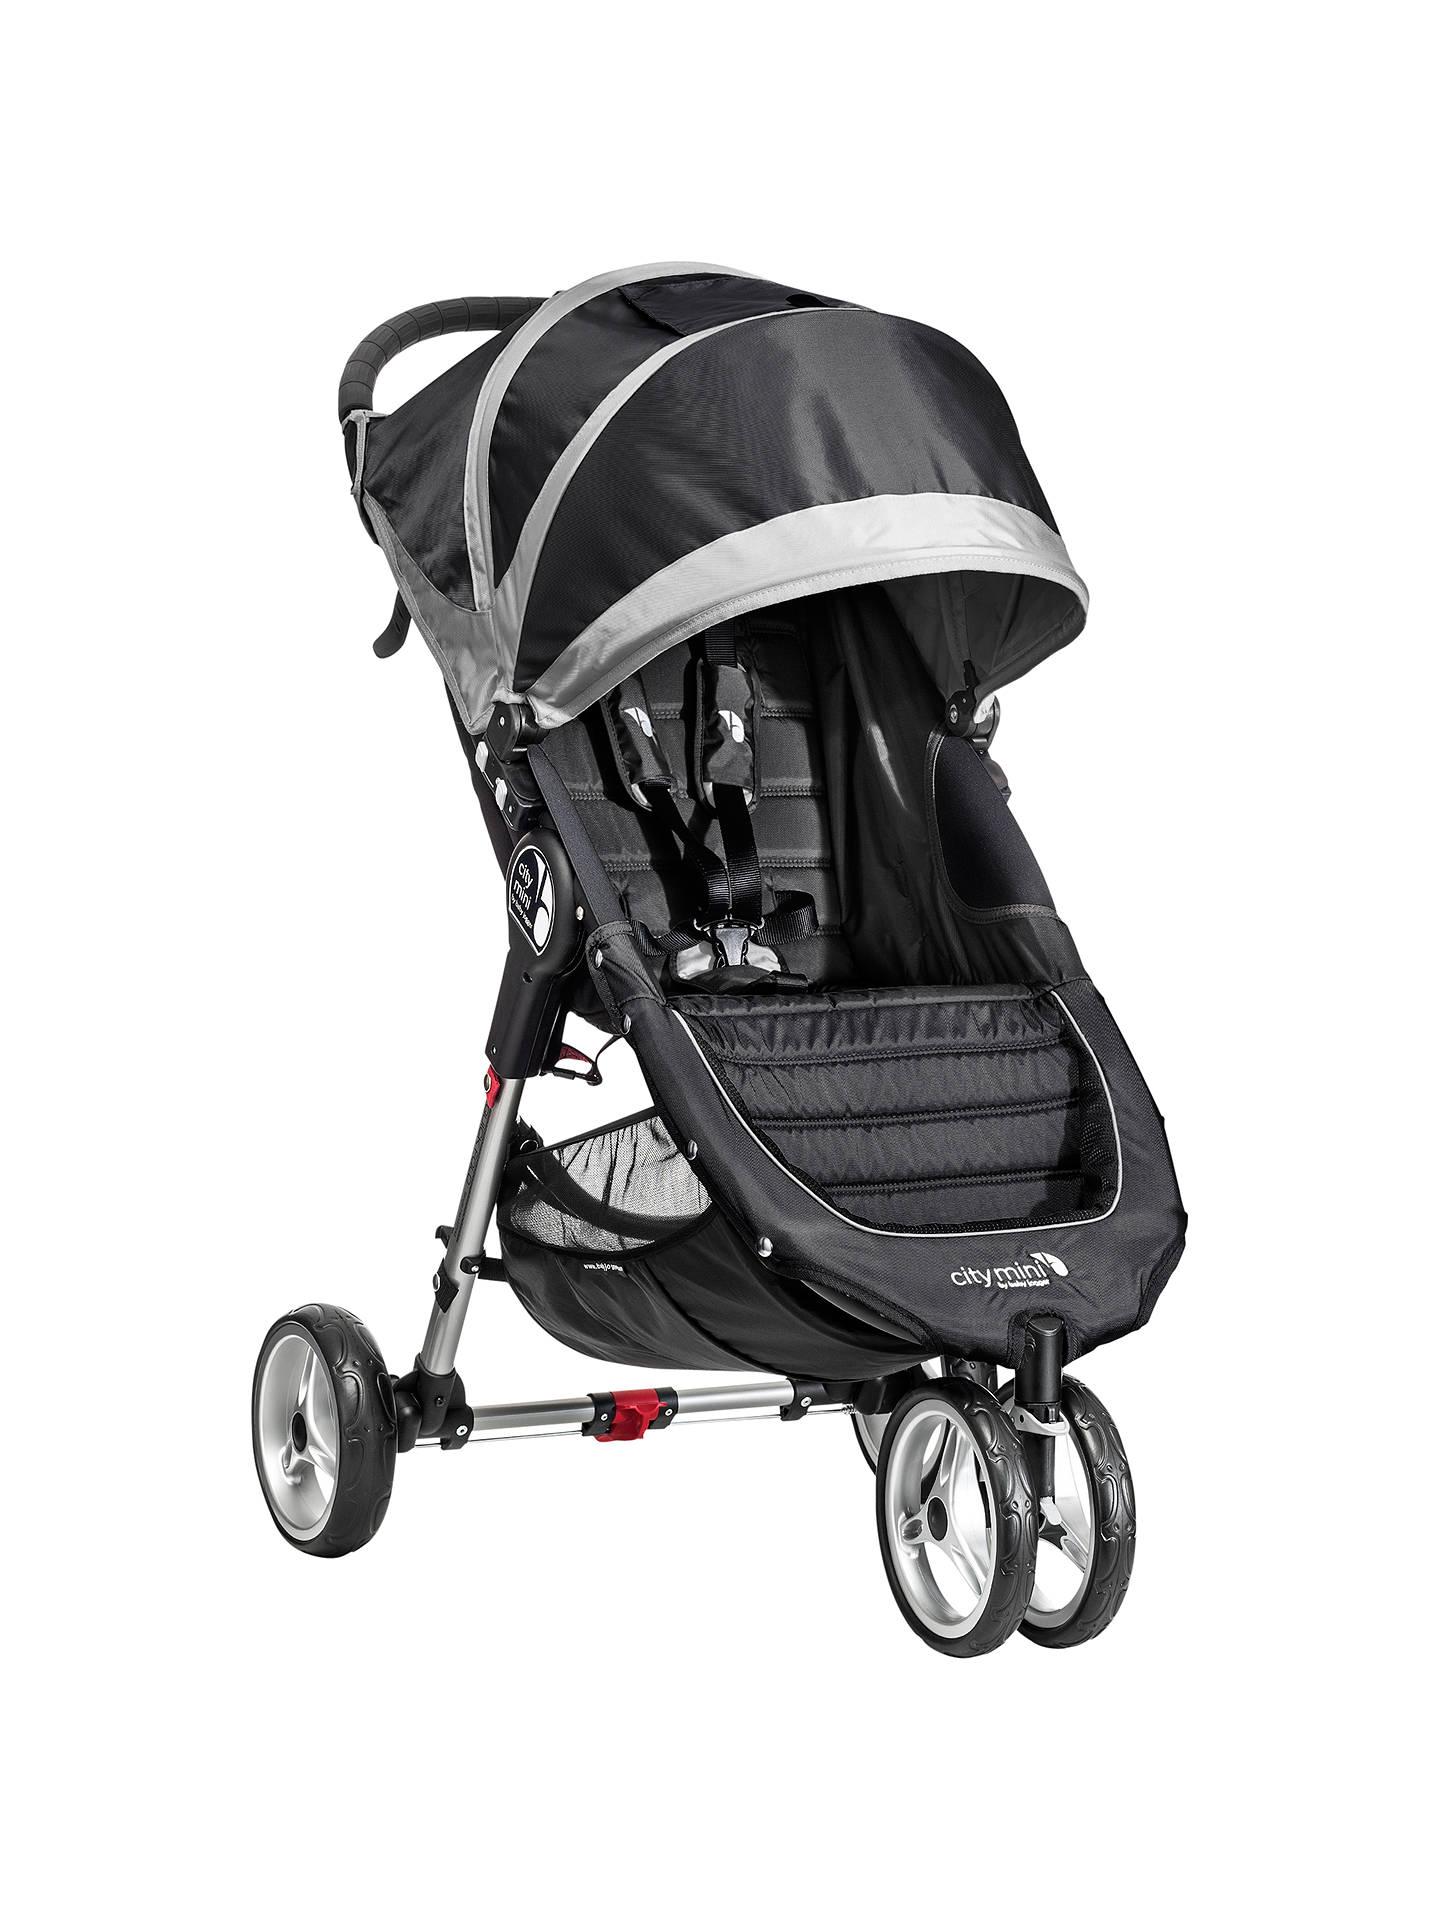 Baby Jogger City Mini 3 Wheel Pushchair Black Grey At